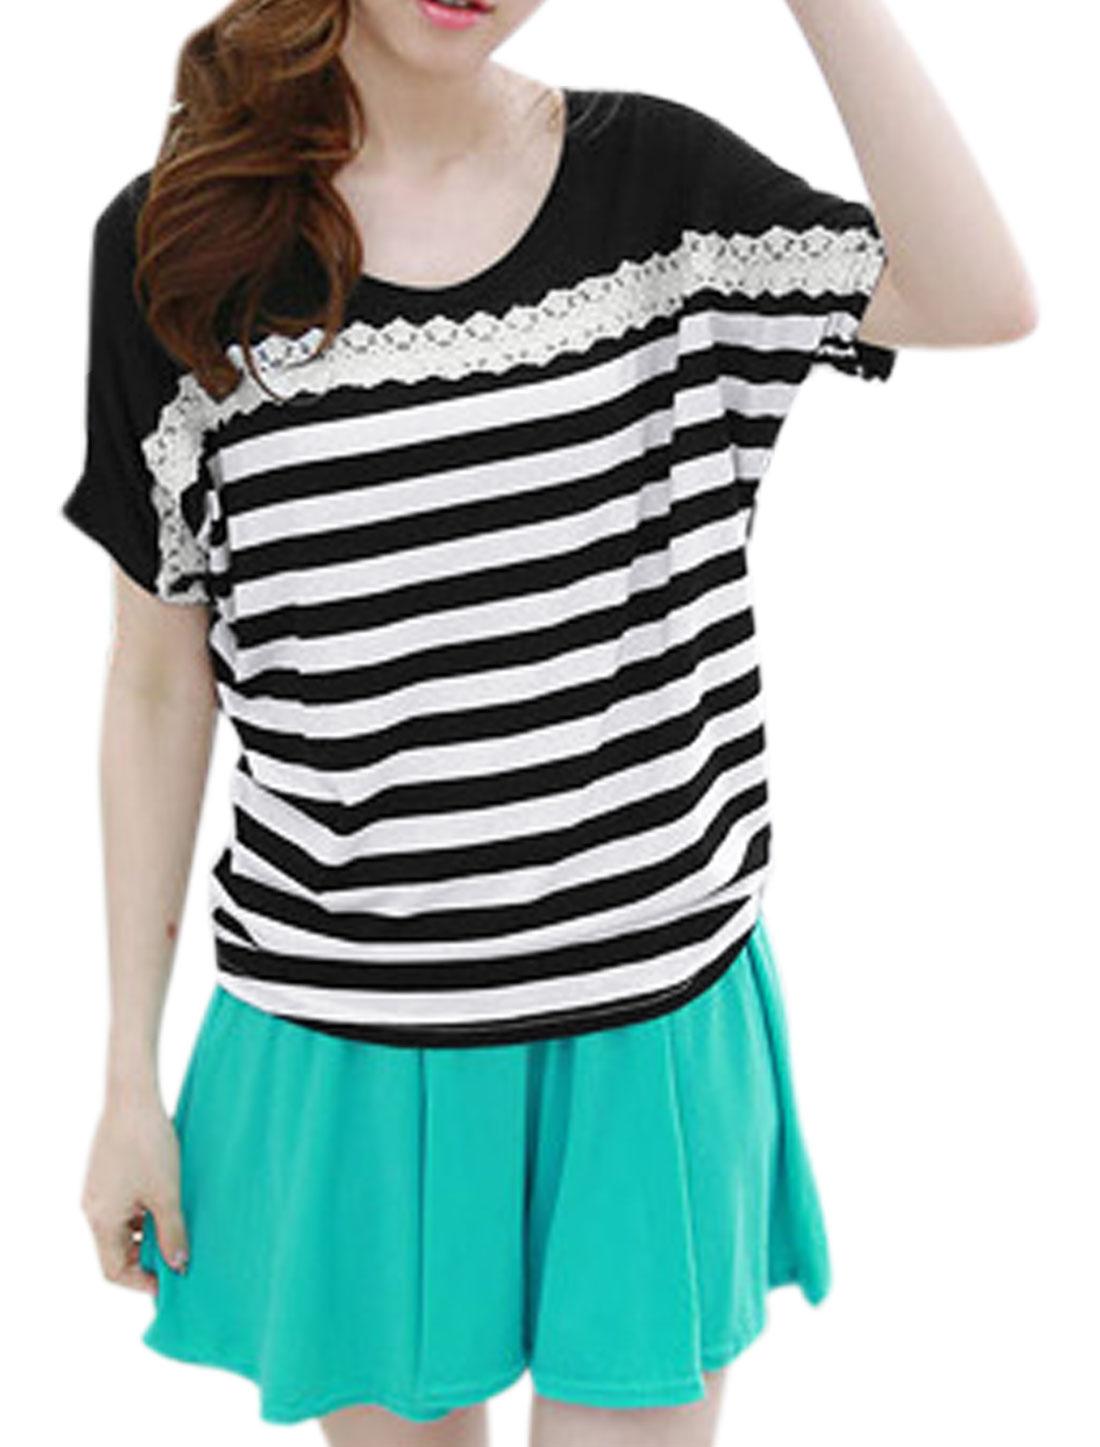 Ladies Short Batwing Sleeve Stripes Lace Decor Loose Fit Blouse Black XS